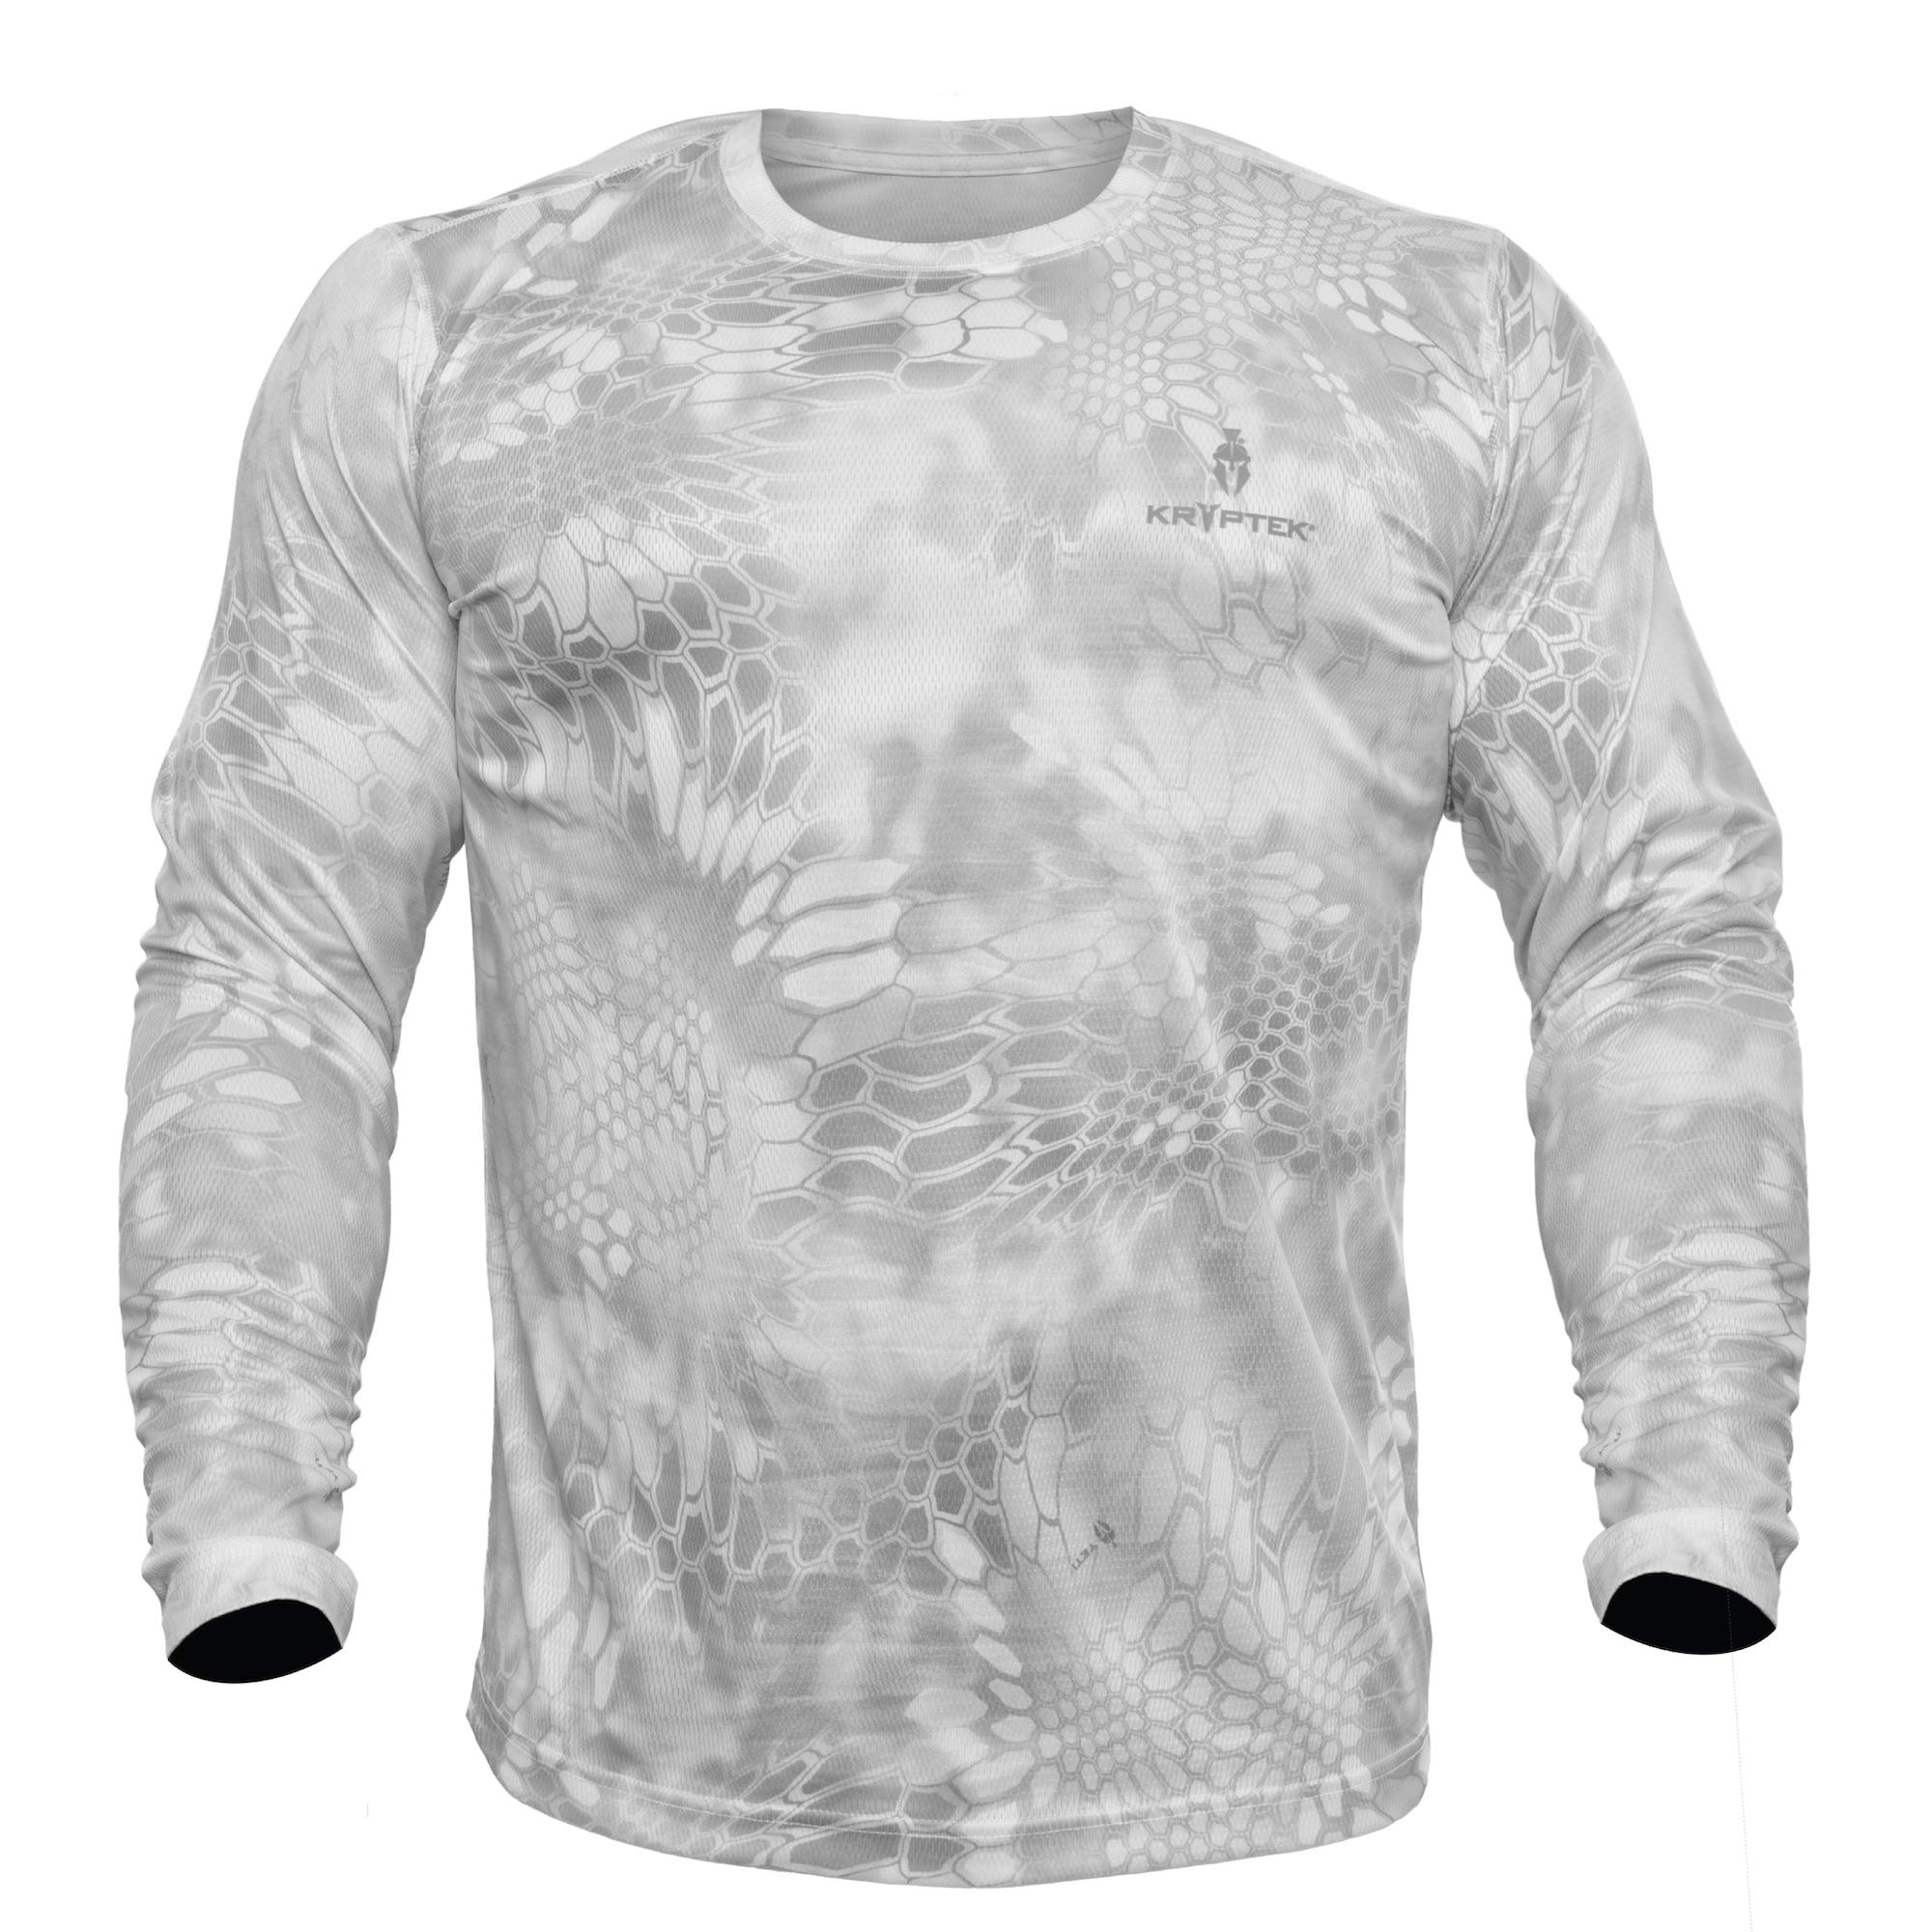 Kryptek Hyperion LS Crew - Long Sleeve Camo Hunting & Fishing Shirt (K-Ore Collection), Wraith, 2XL by Kryptek